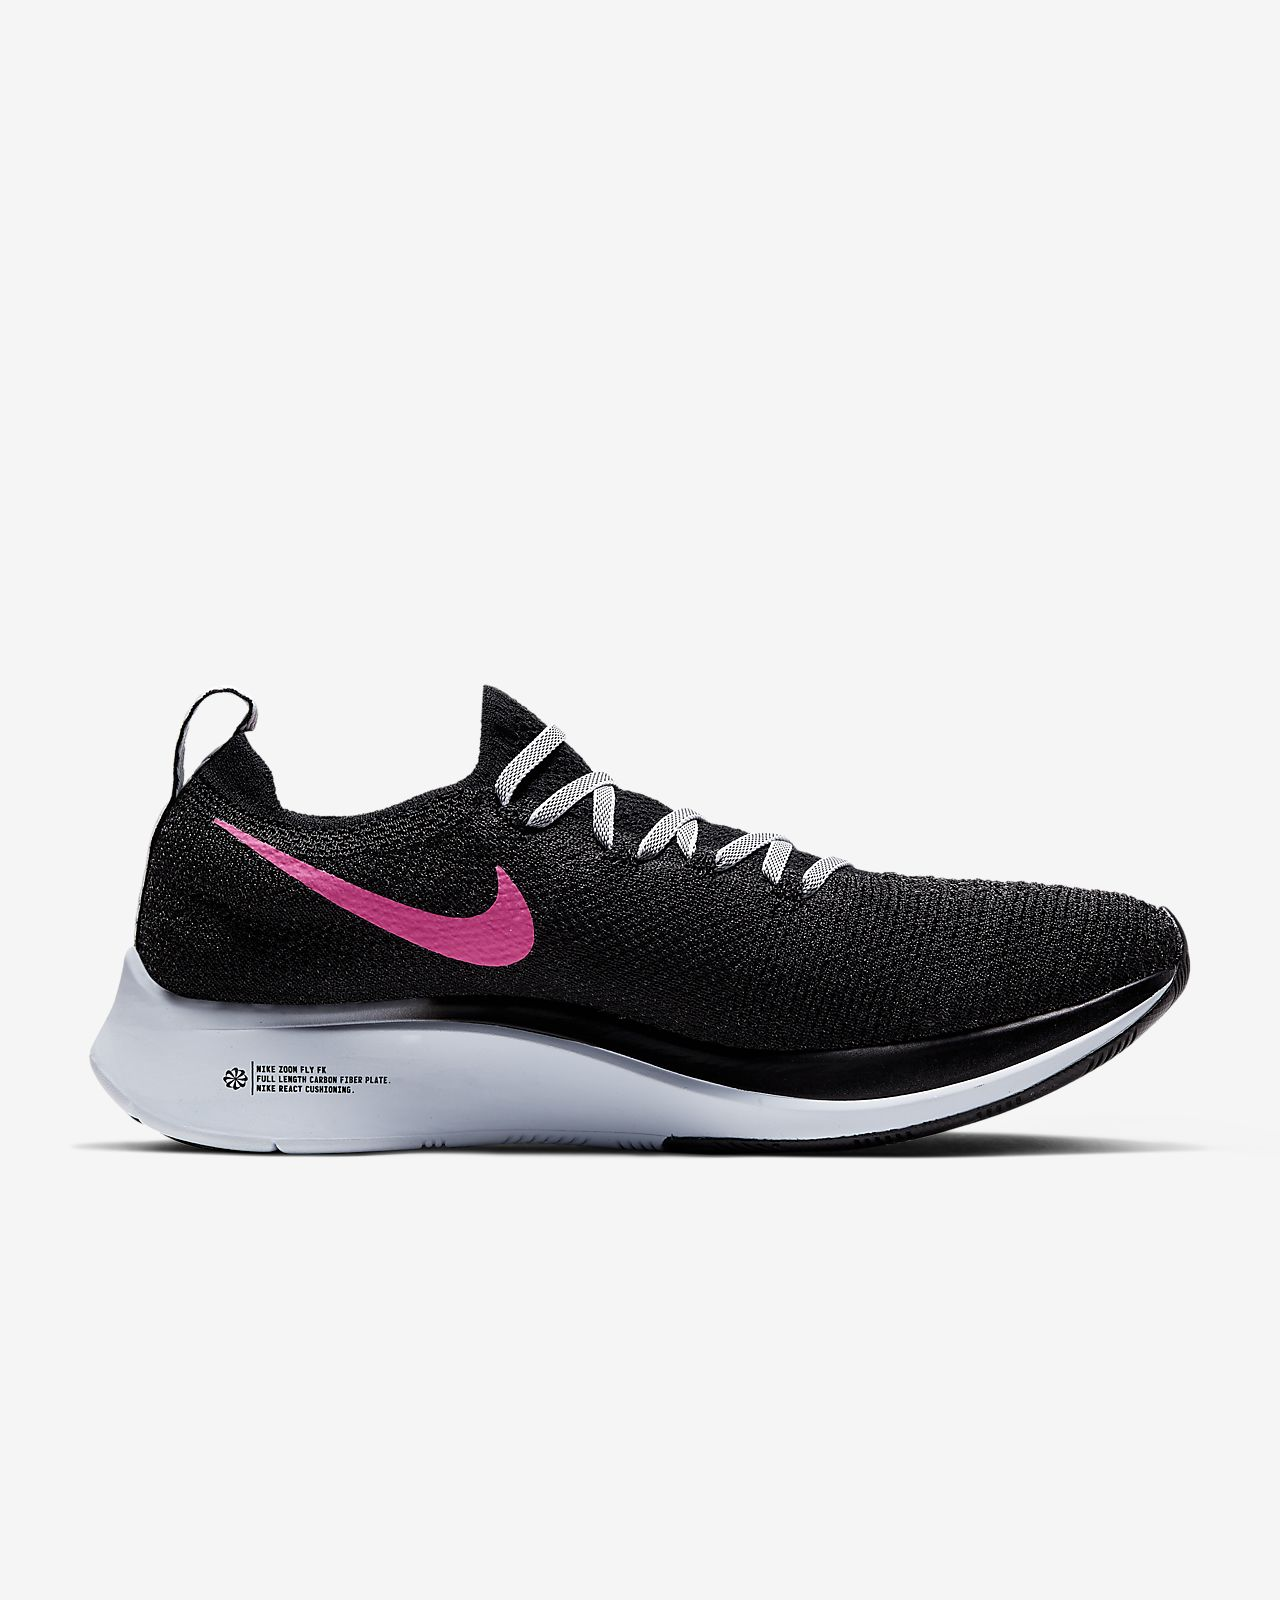 design de qualité 60f2d 4a255 Chaussure de running Nike Zoom Fly Flyknit pour Femme